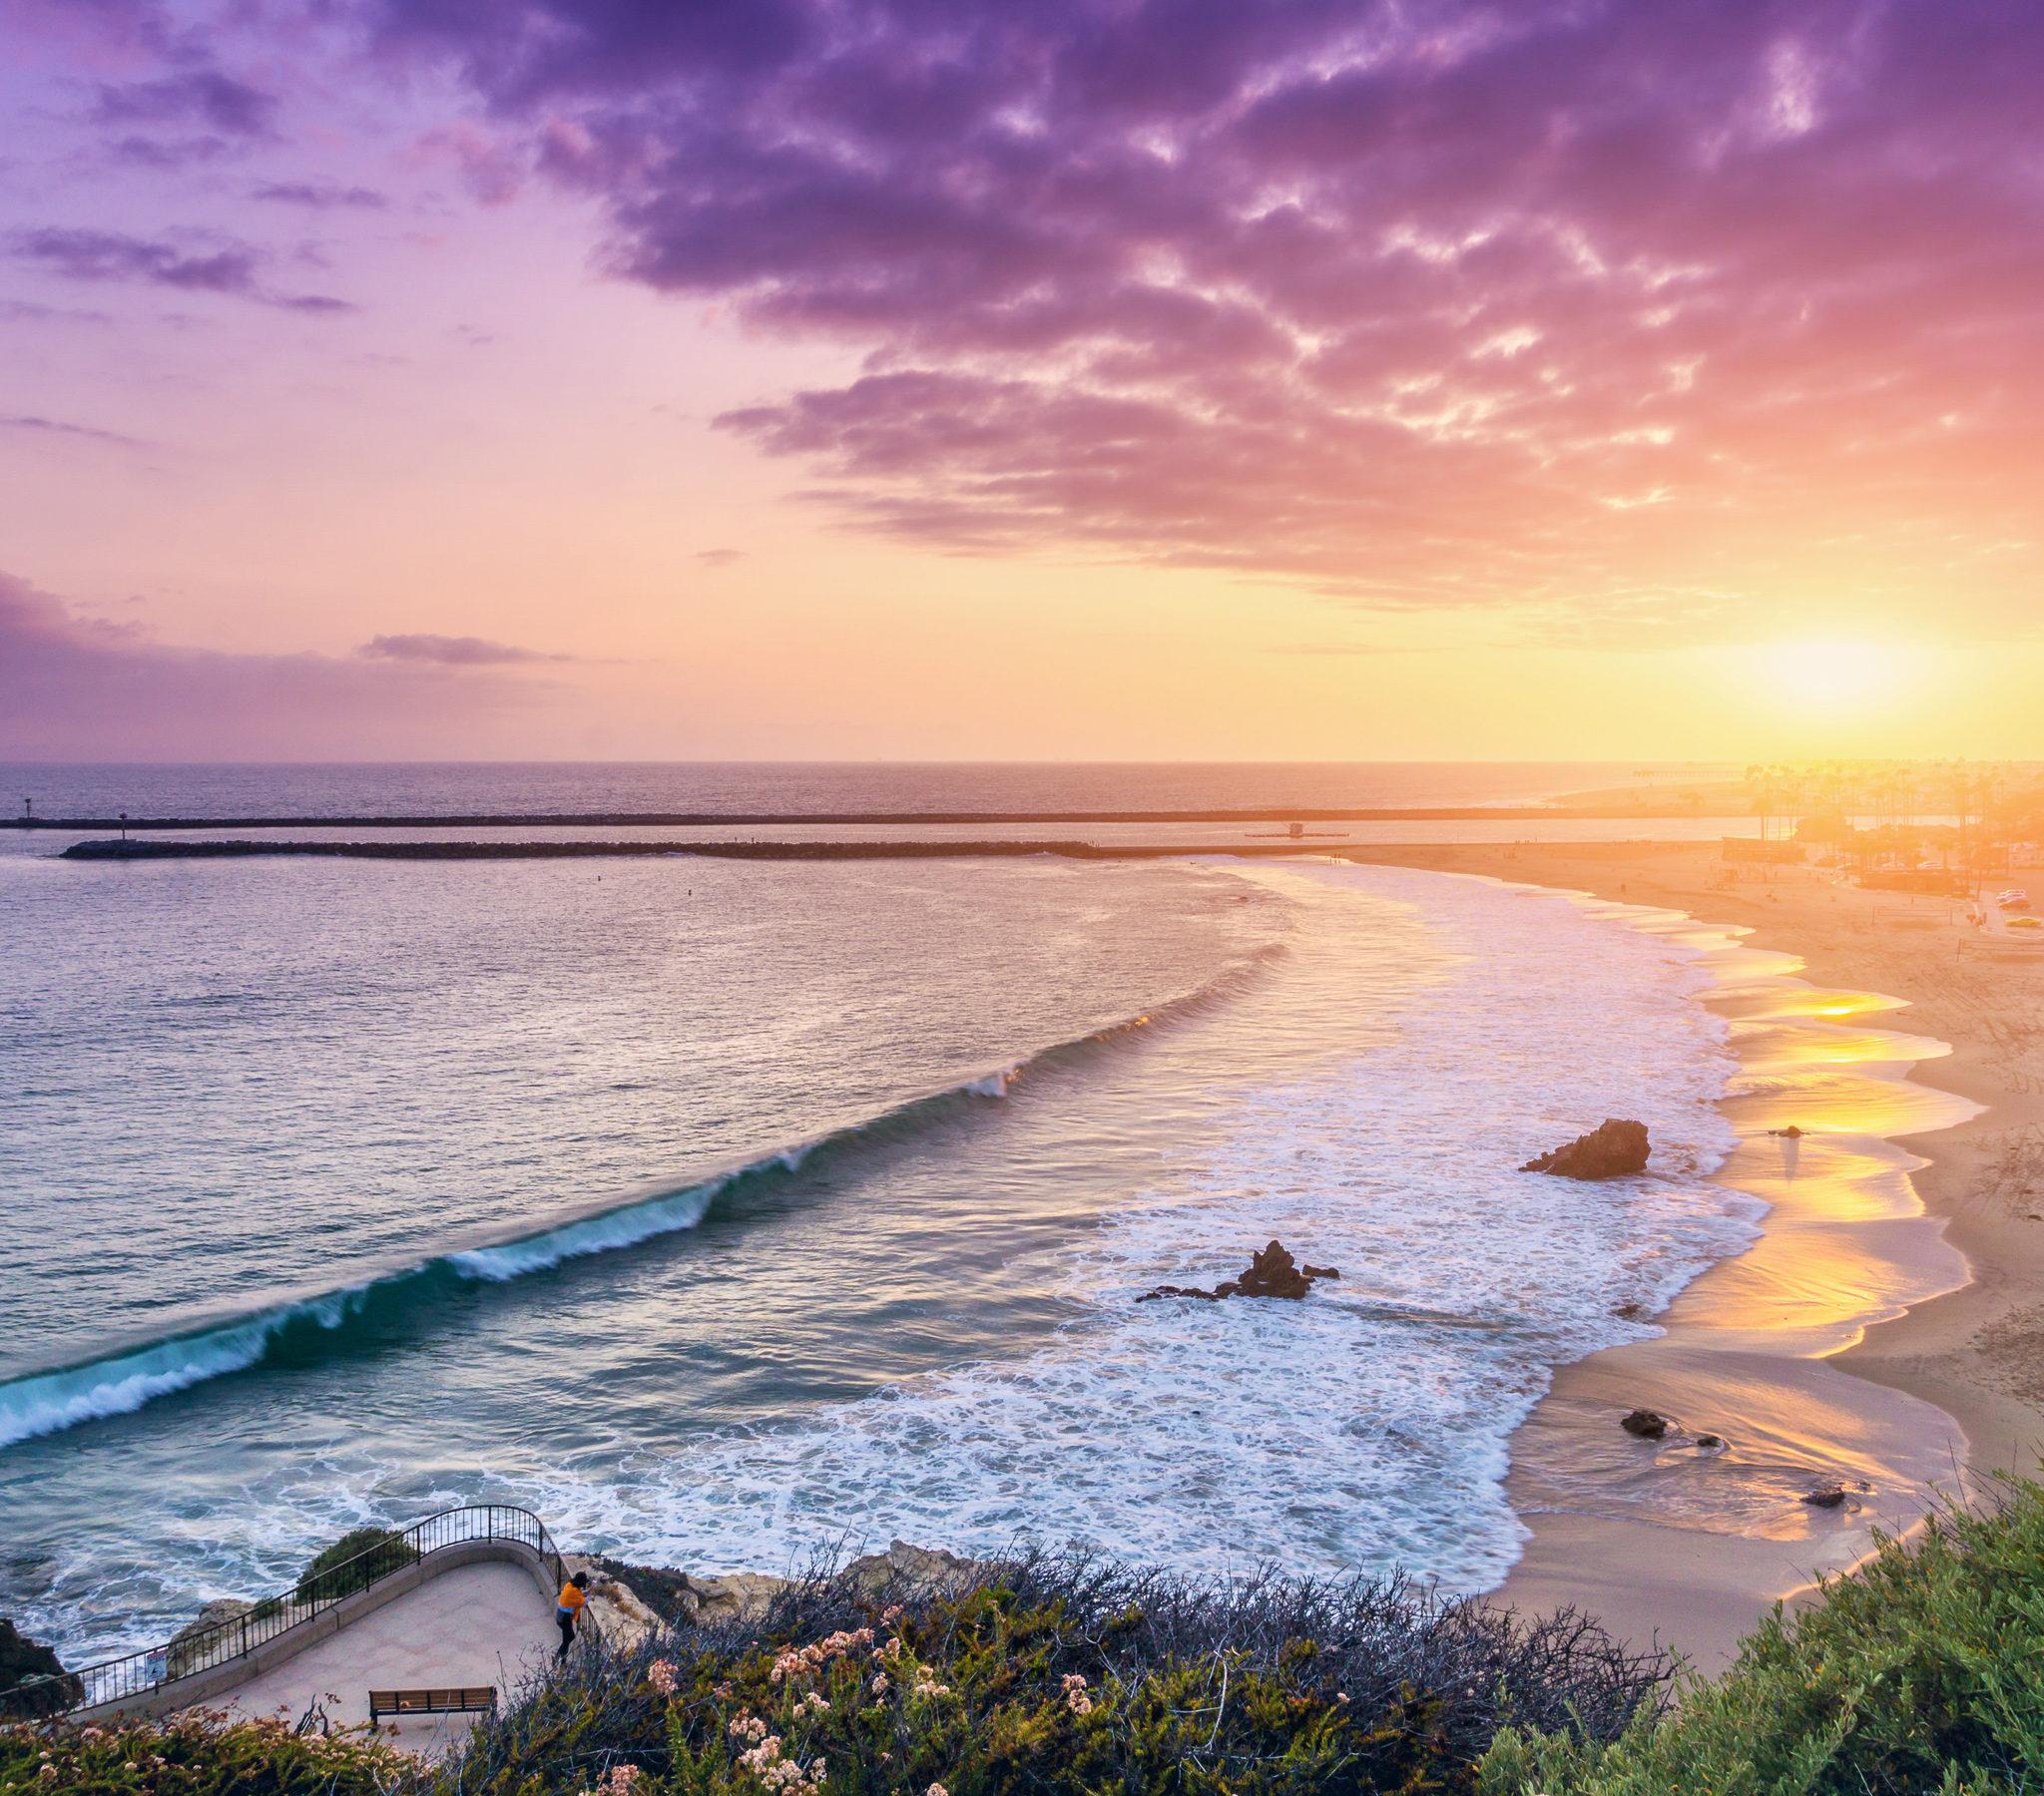 Iphone 5s Beach Wallpaper Corona Del Mar Newport Beach Wallpapers Hd Wallpapers